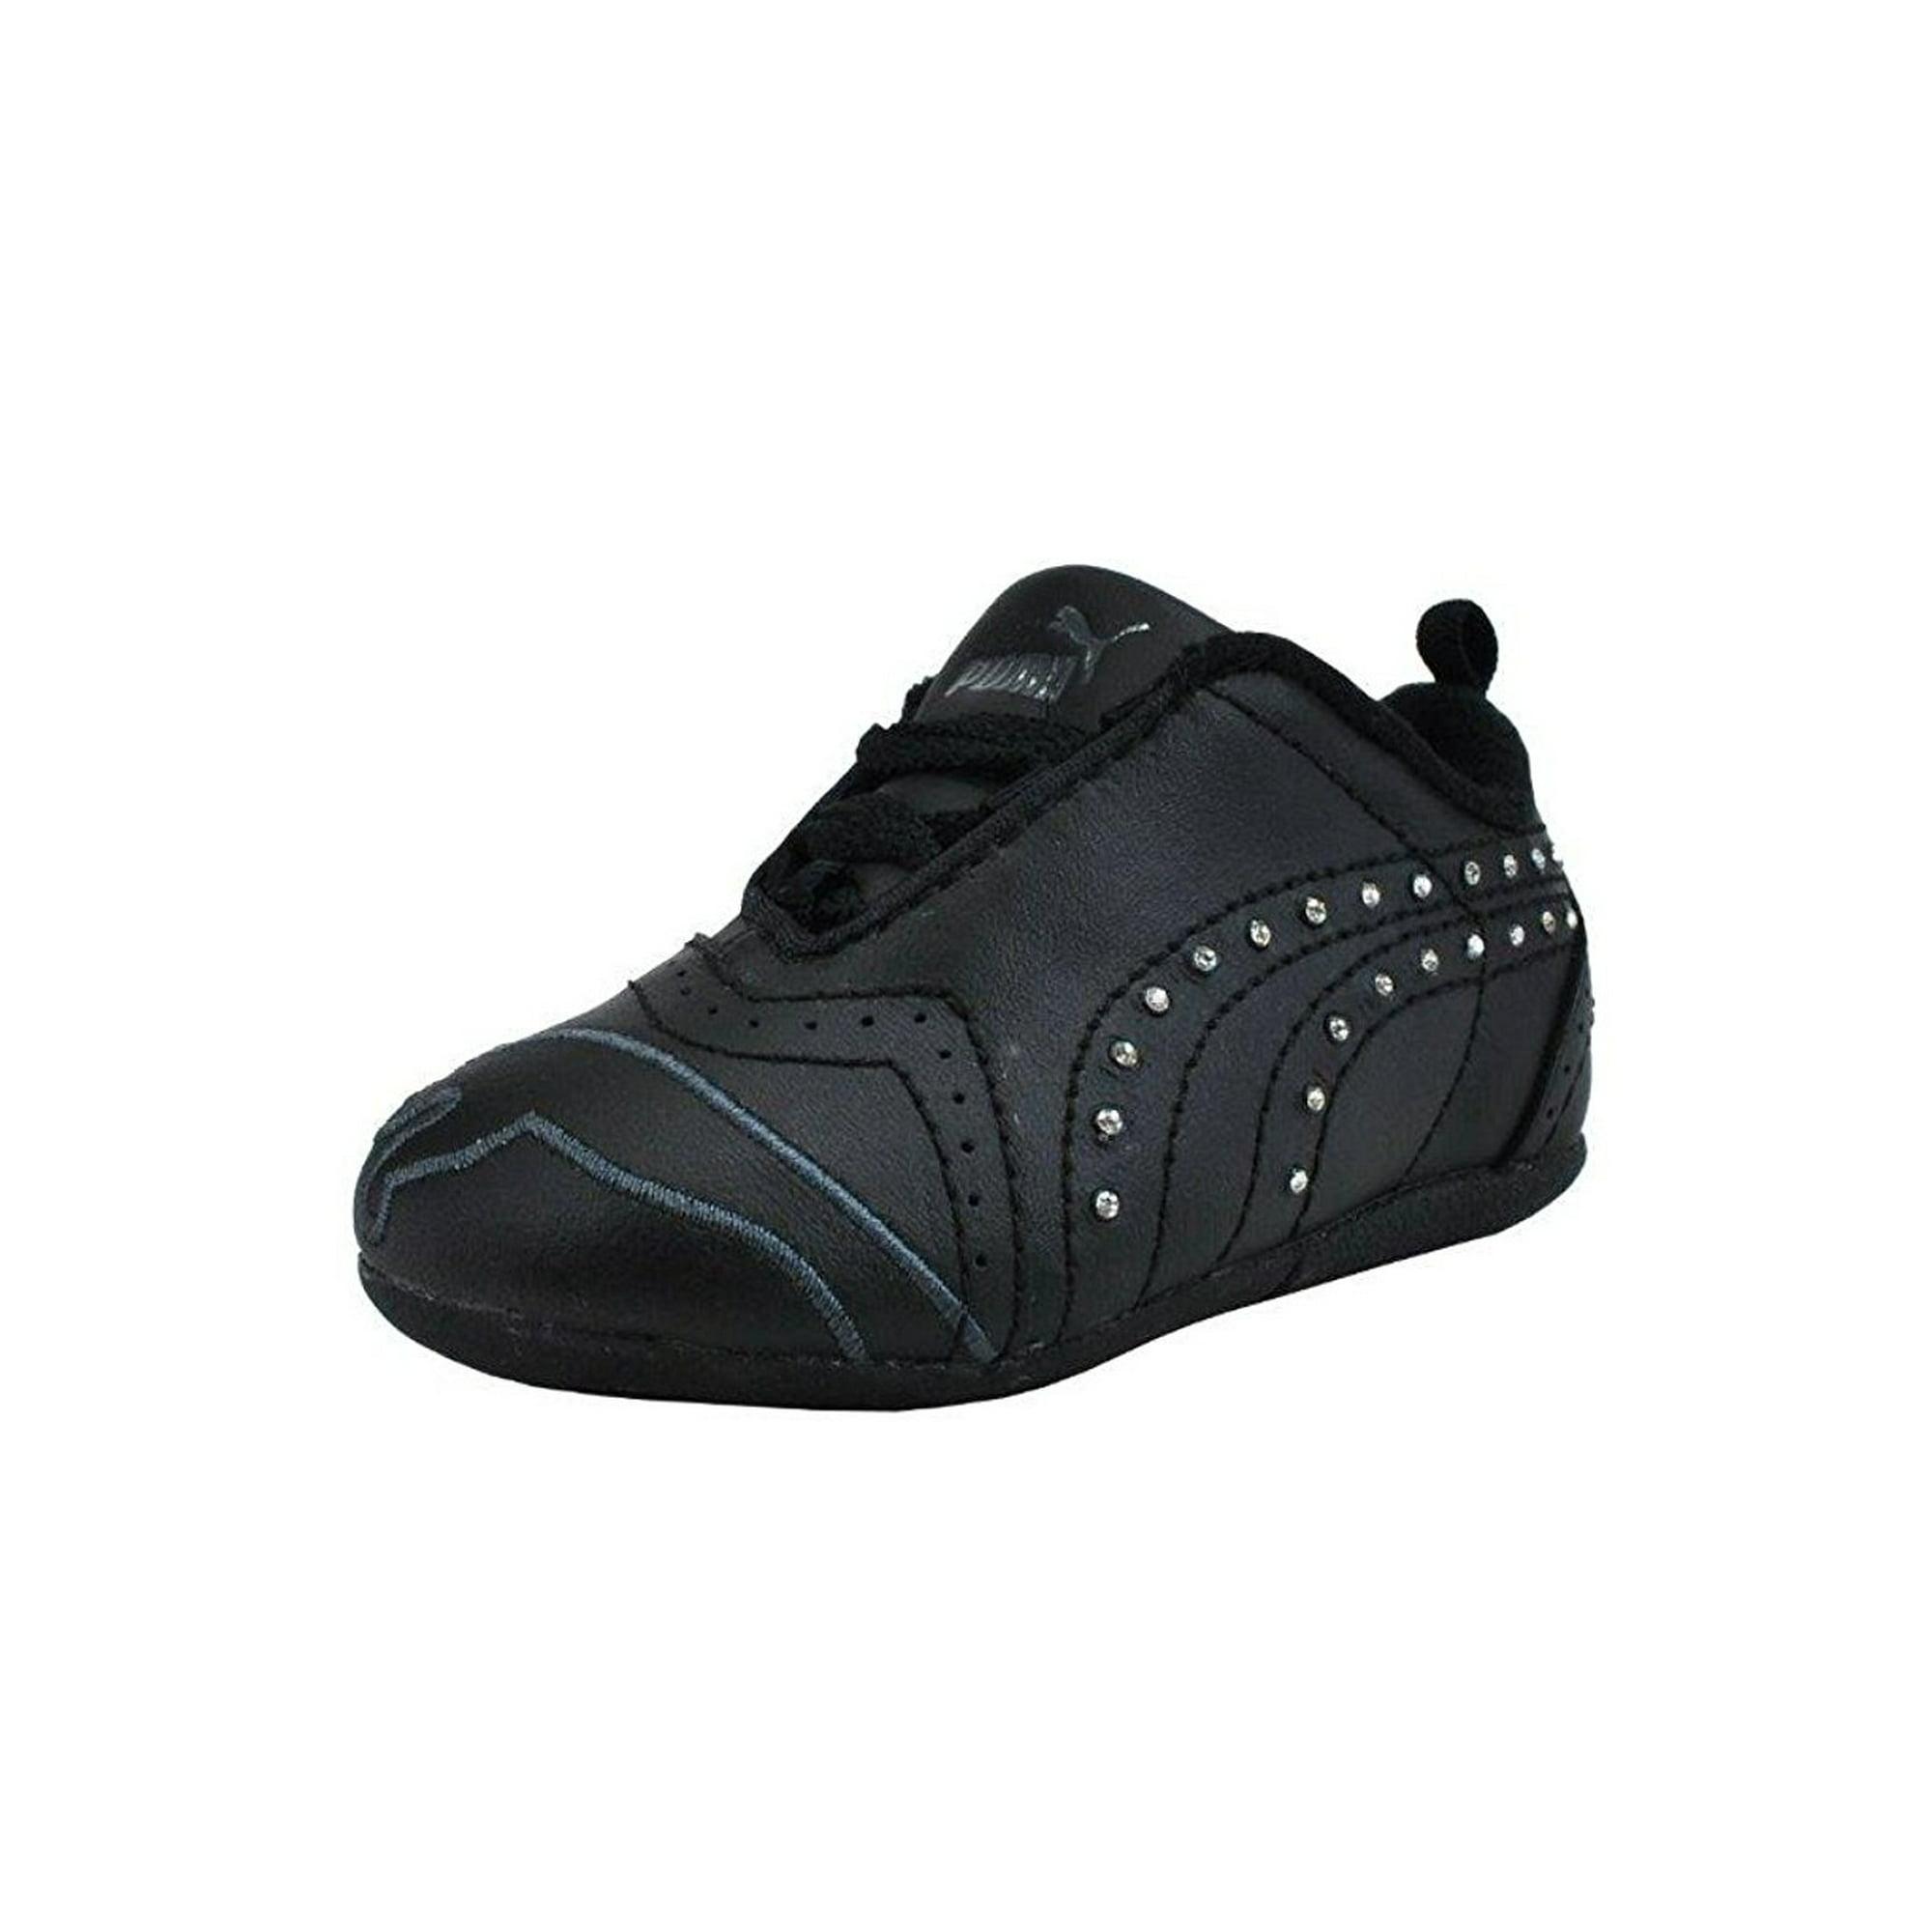 cd40c97fd43 Buy Puma Shoes Sela Diamond Rhinestone Infant Toddler Girls Black ...